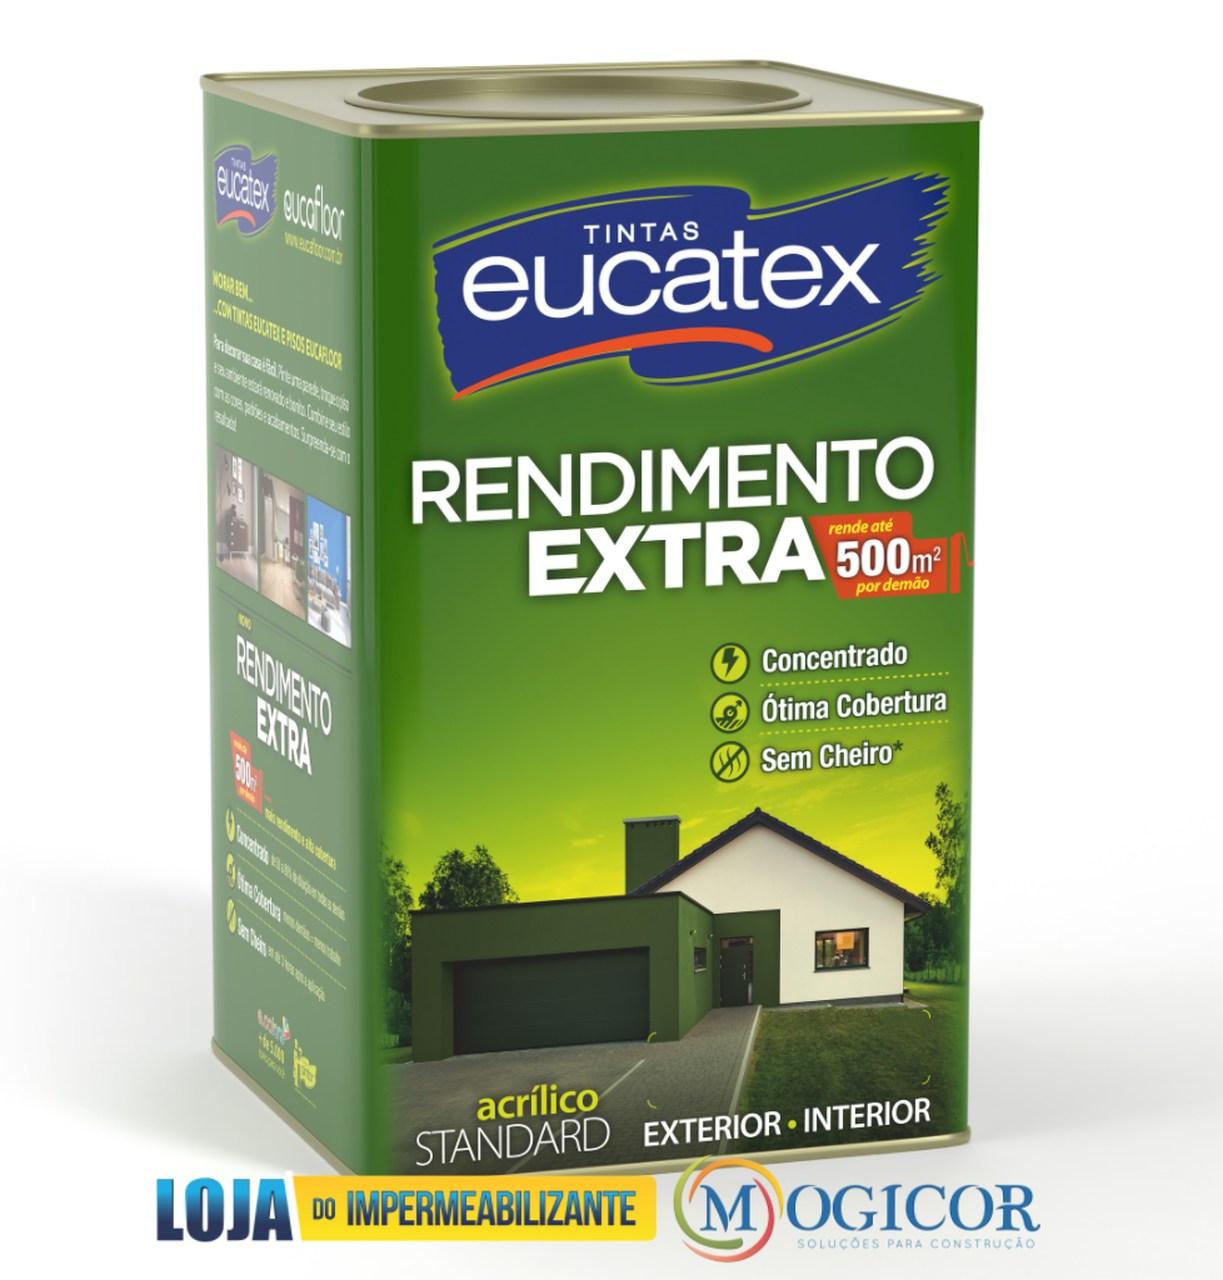 Tinta Acrílica Rendimento Extra 500m² P/ Paredes Internas & Externas 18L Eucatex